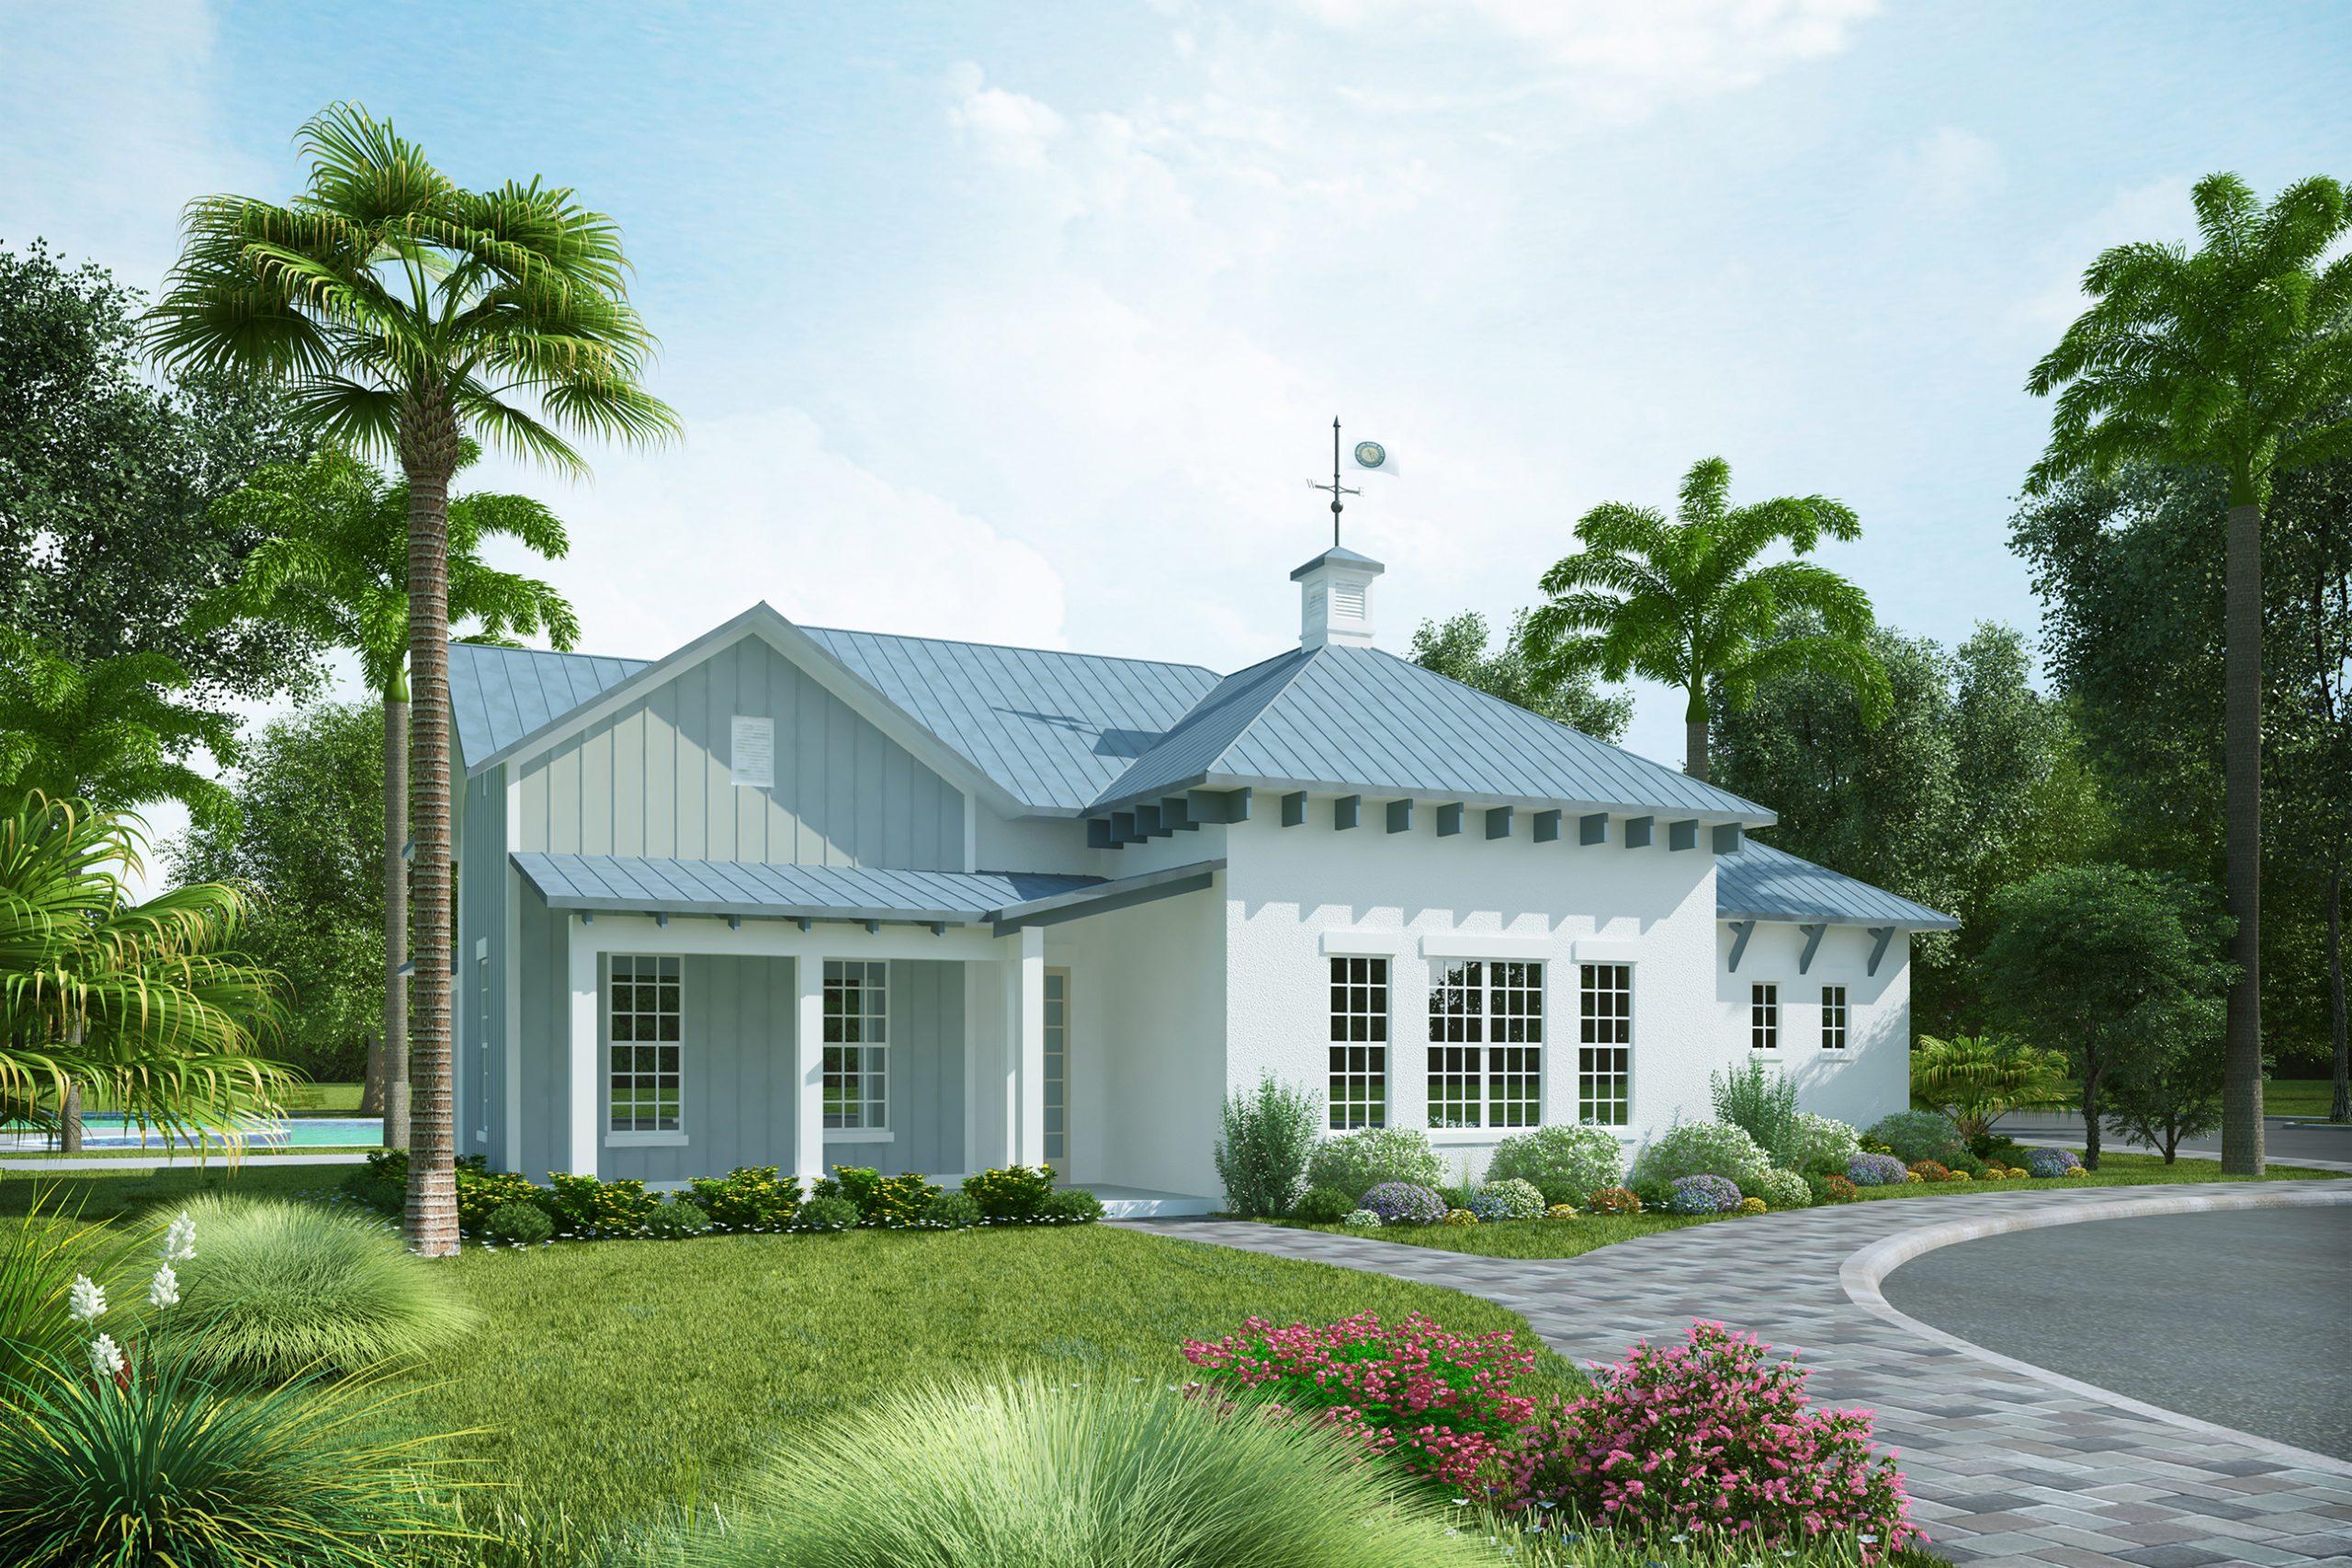 New Master Amenity club house